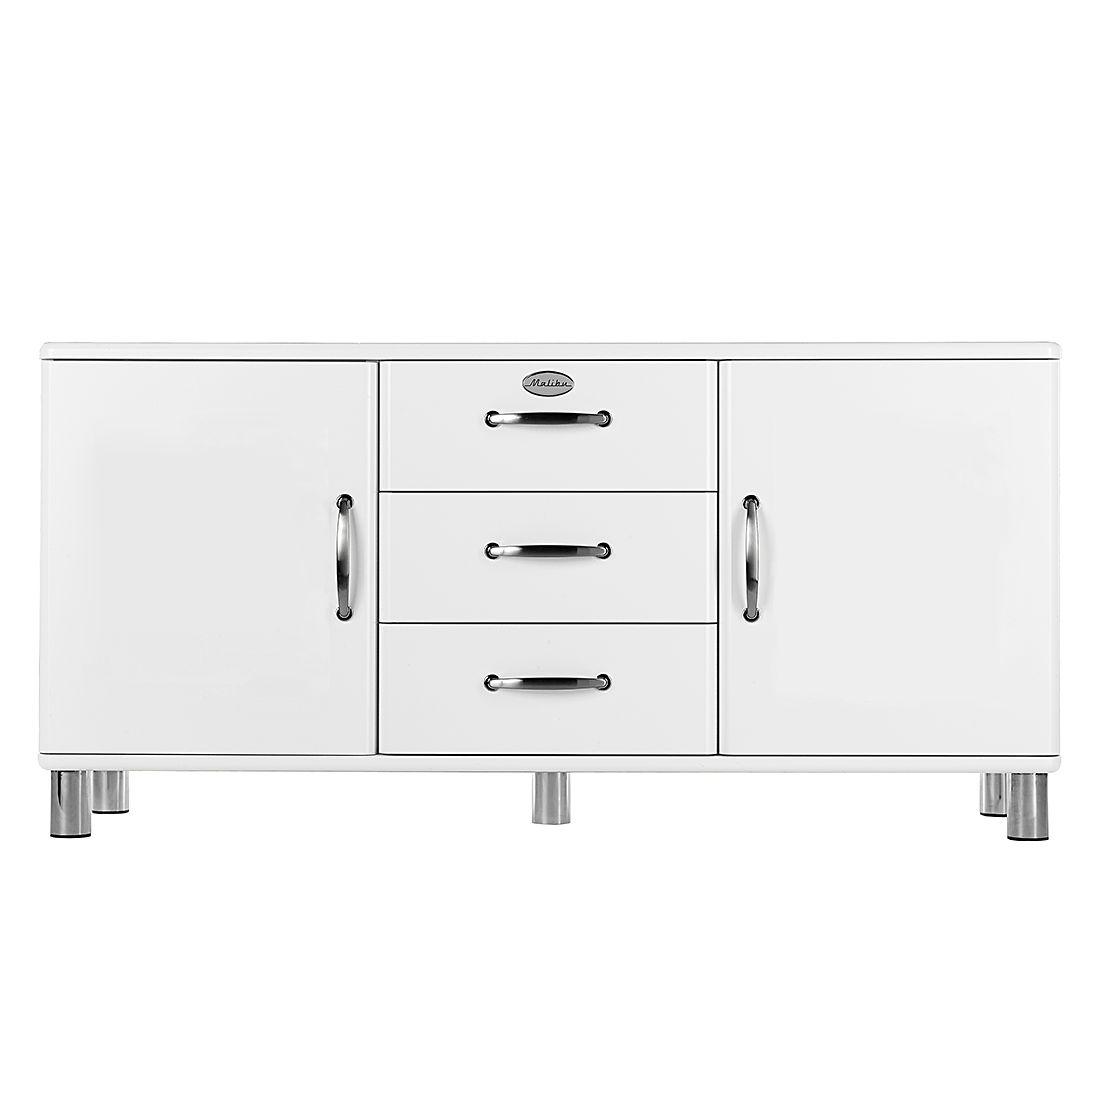 Sideboard Malibu Ii | Products | Wohnzimmer, Möbel Und Inside Malibu 2 Door 4 Drawer Sideboards (View 23 of 30)